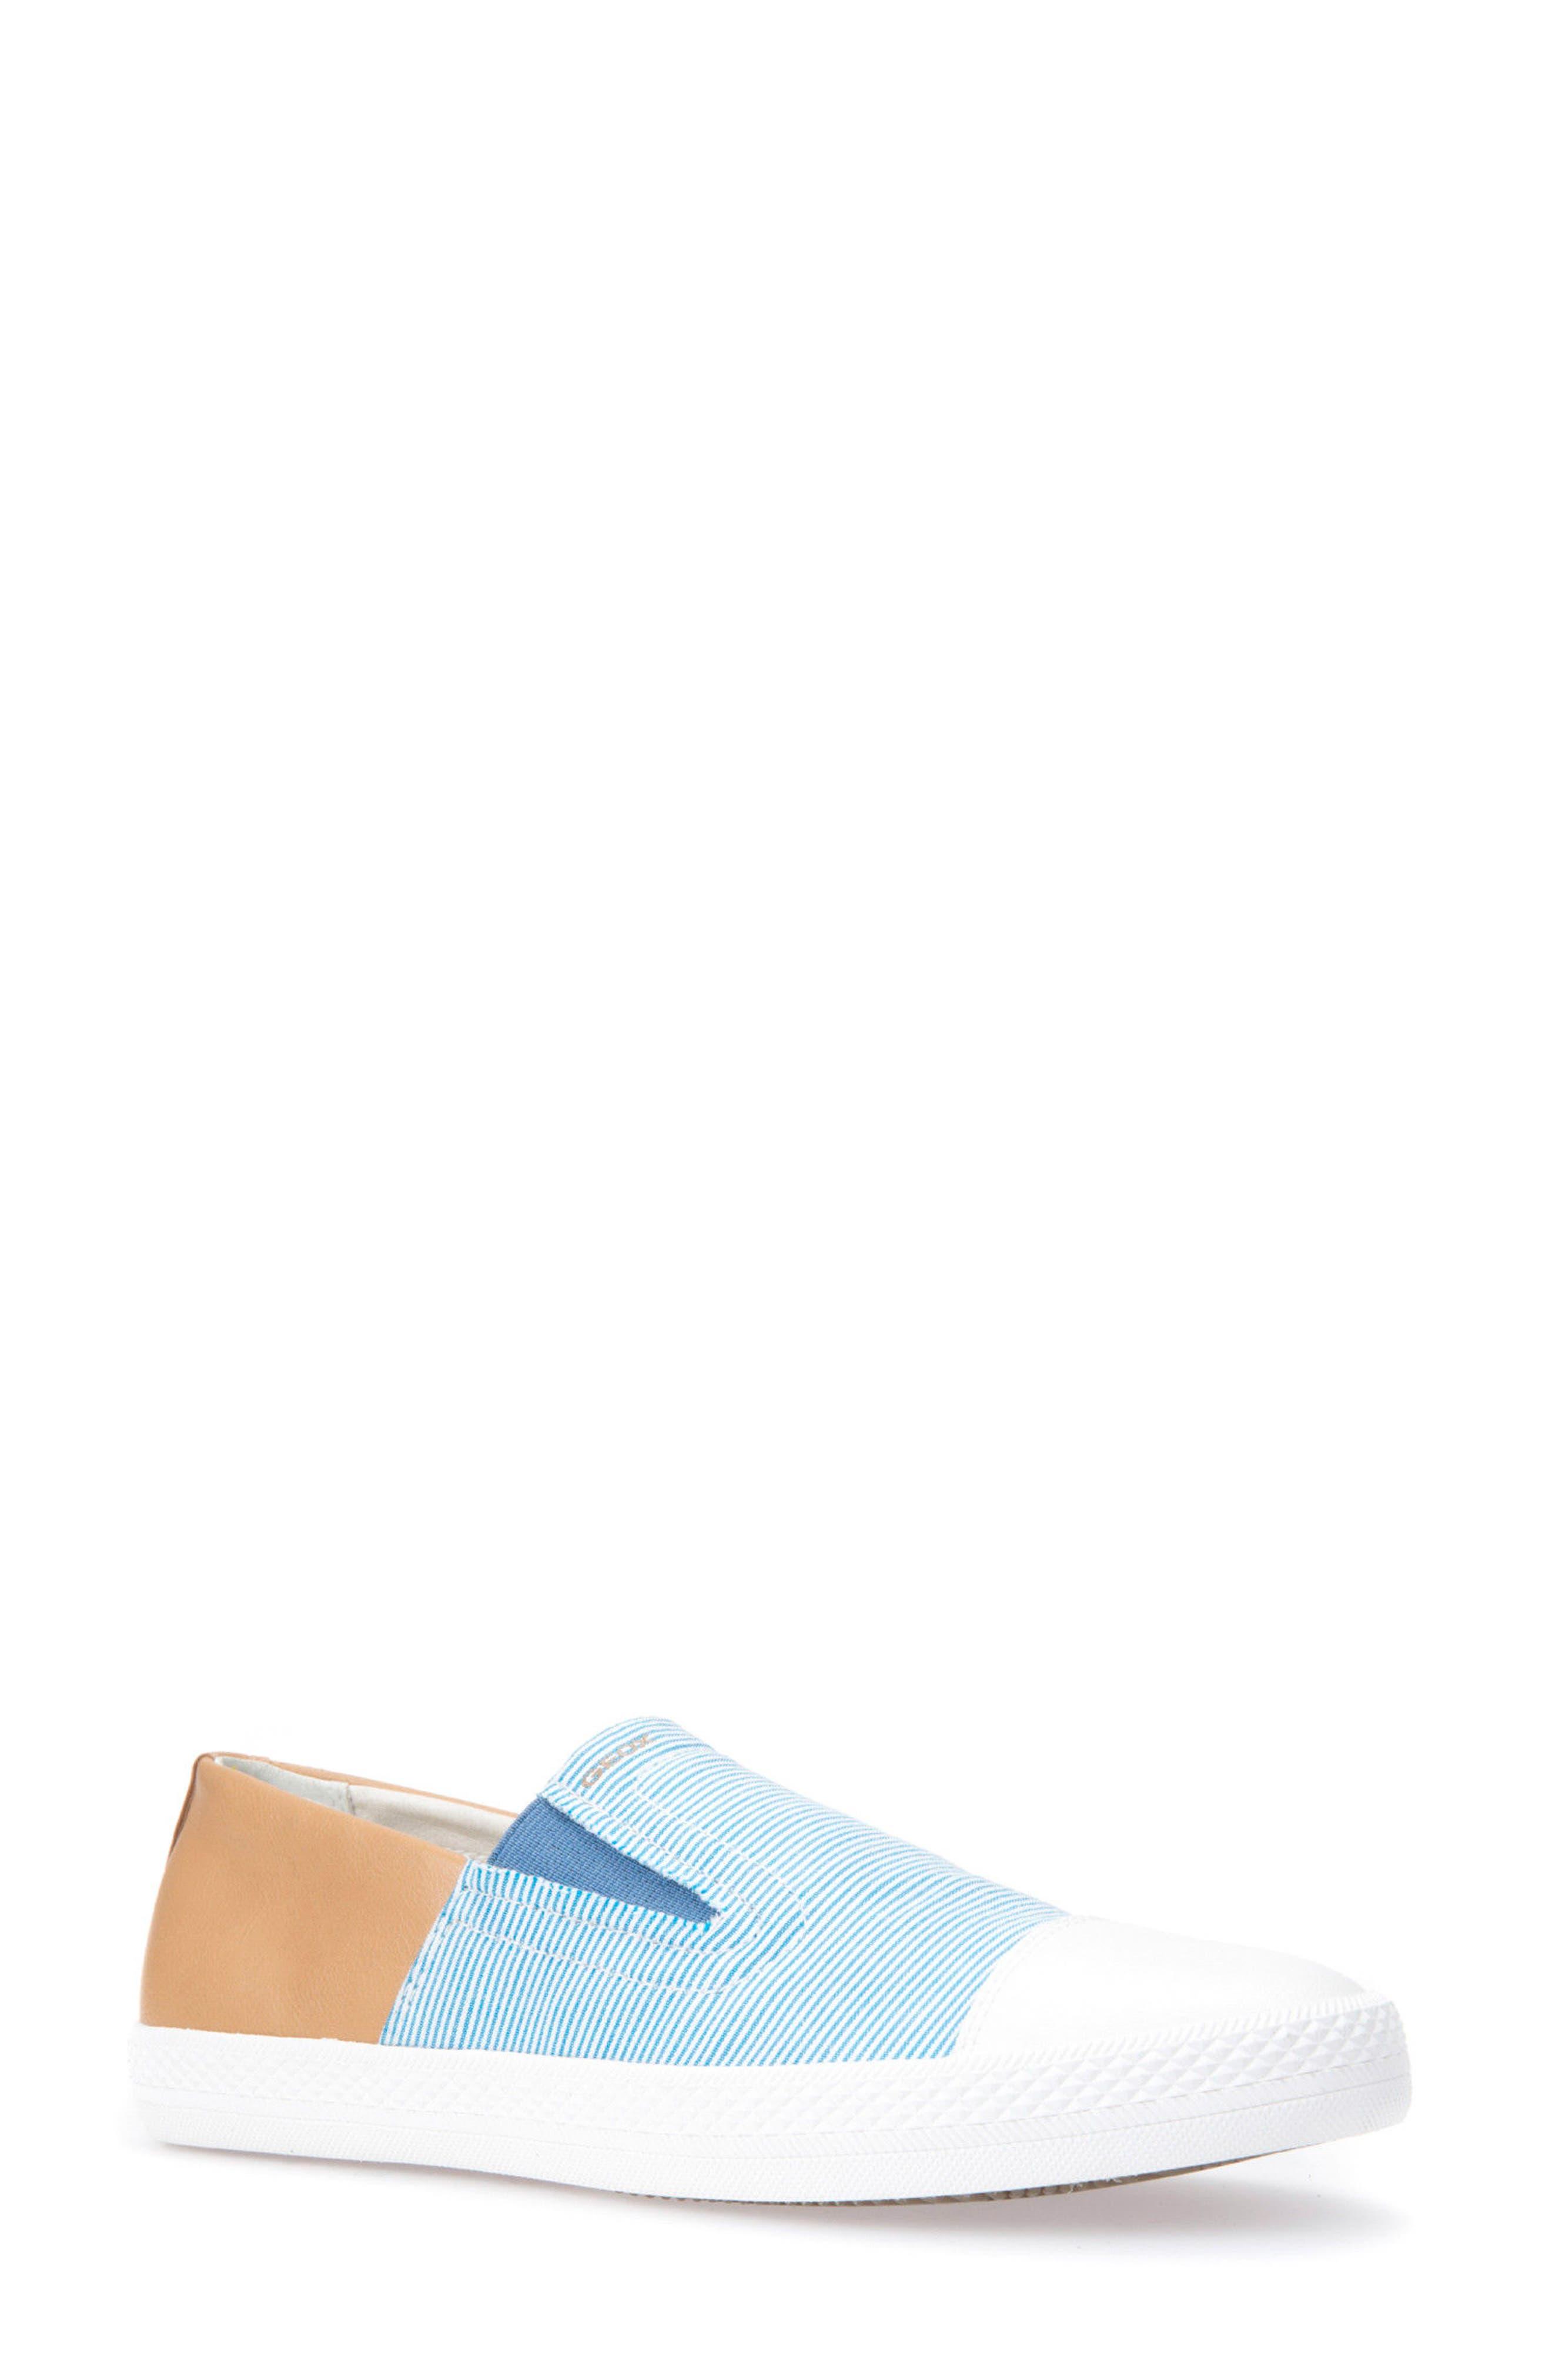 Giyo Slip-On Sneaker, Main, color, 462